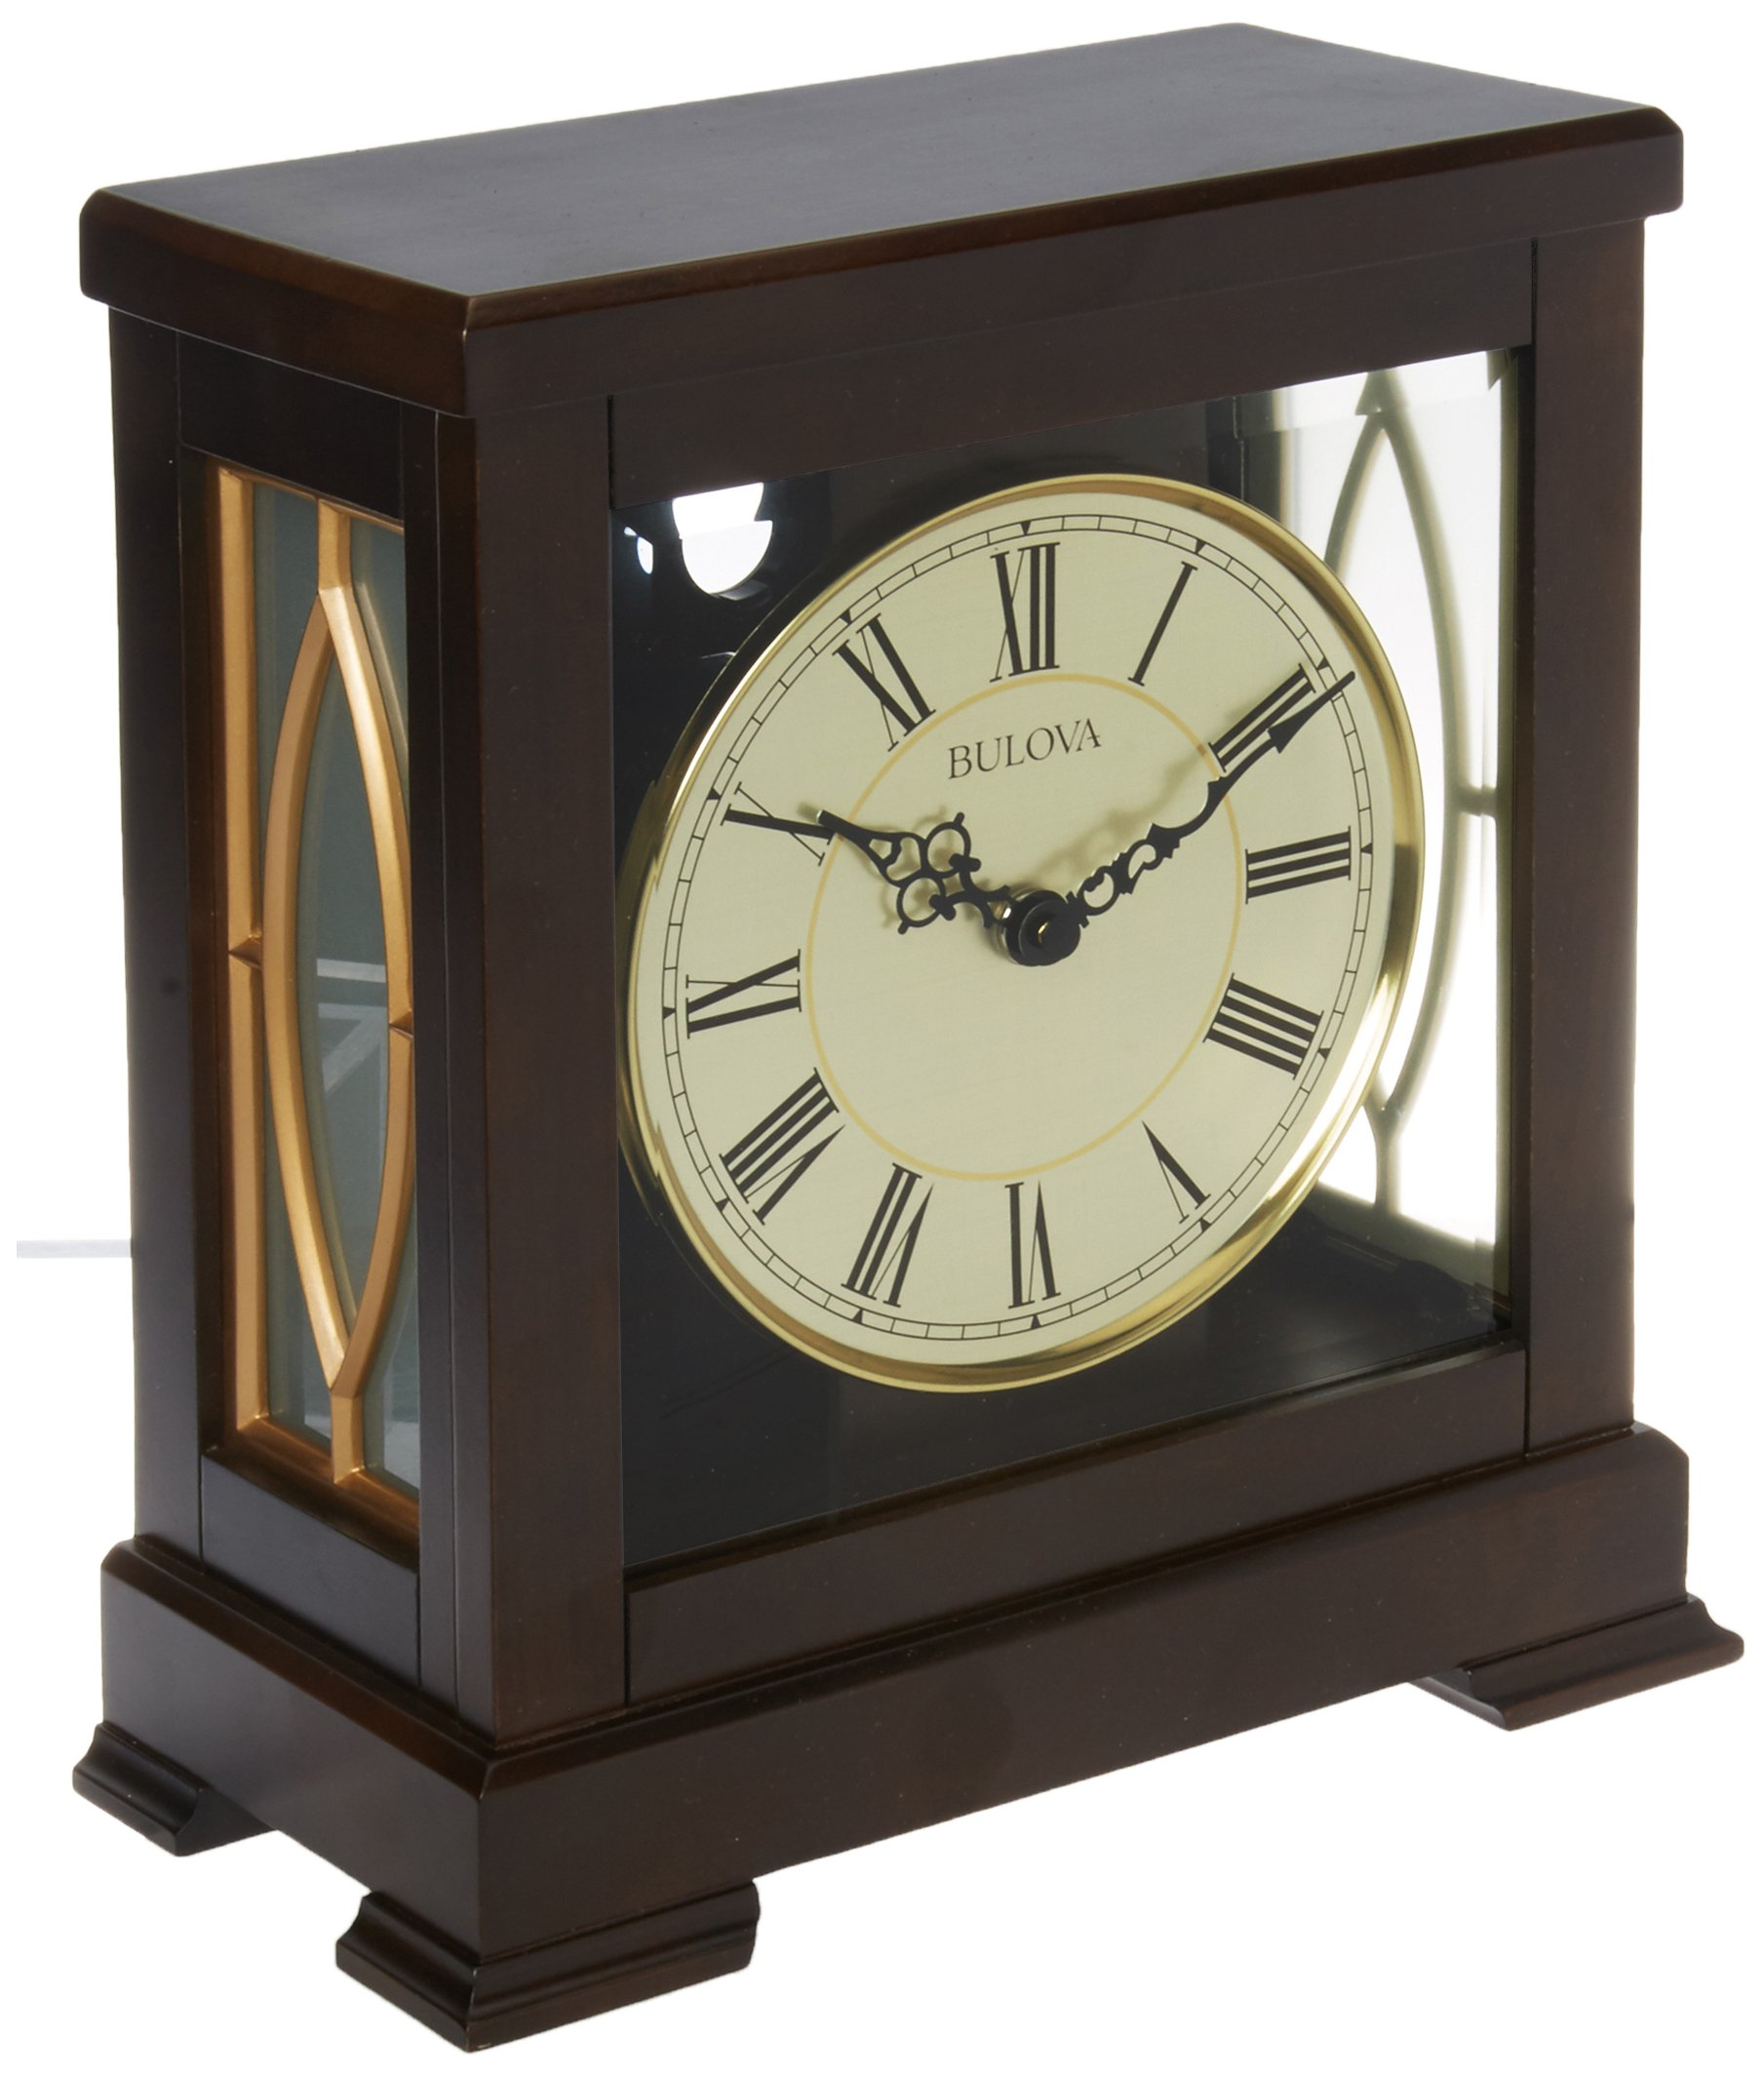 Bulova B1653 Victory Mantel Chime Clock, Brown by Bulova